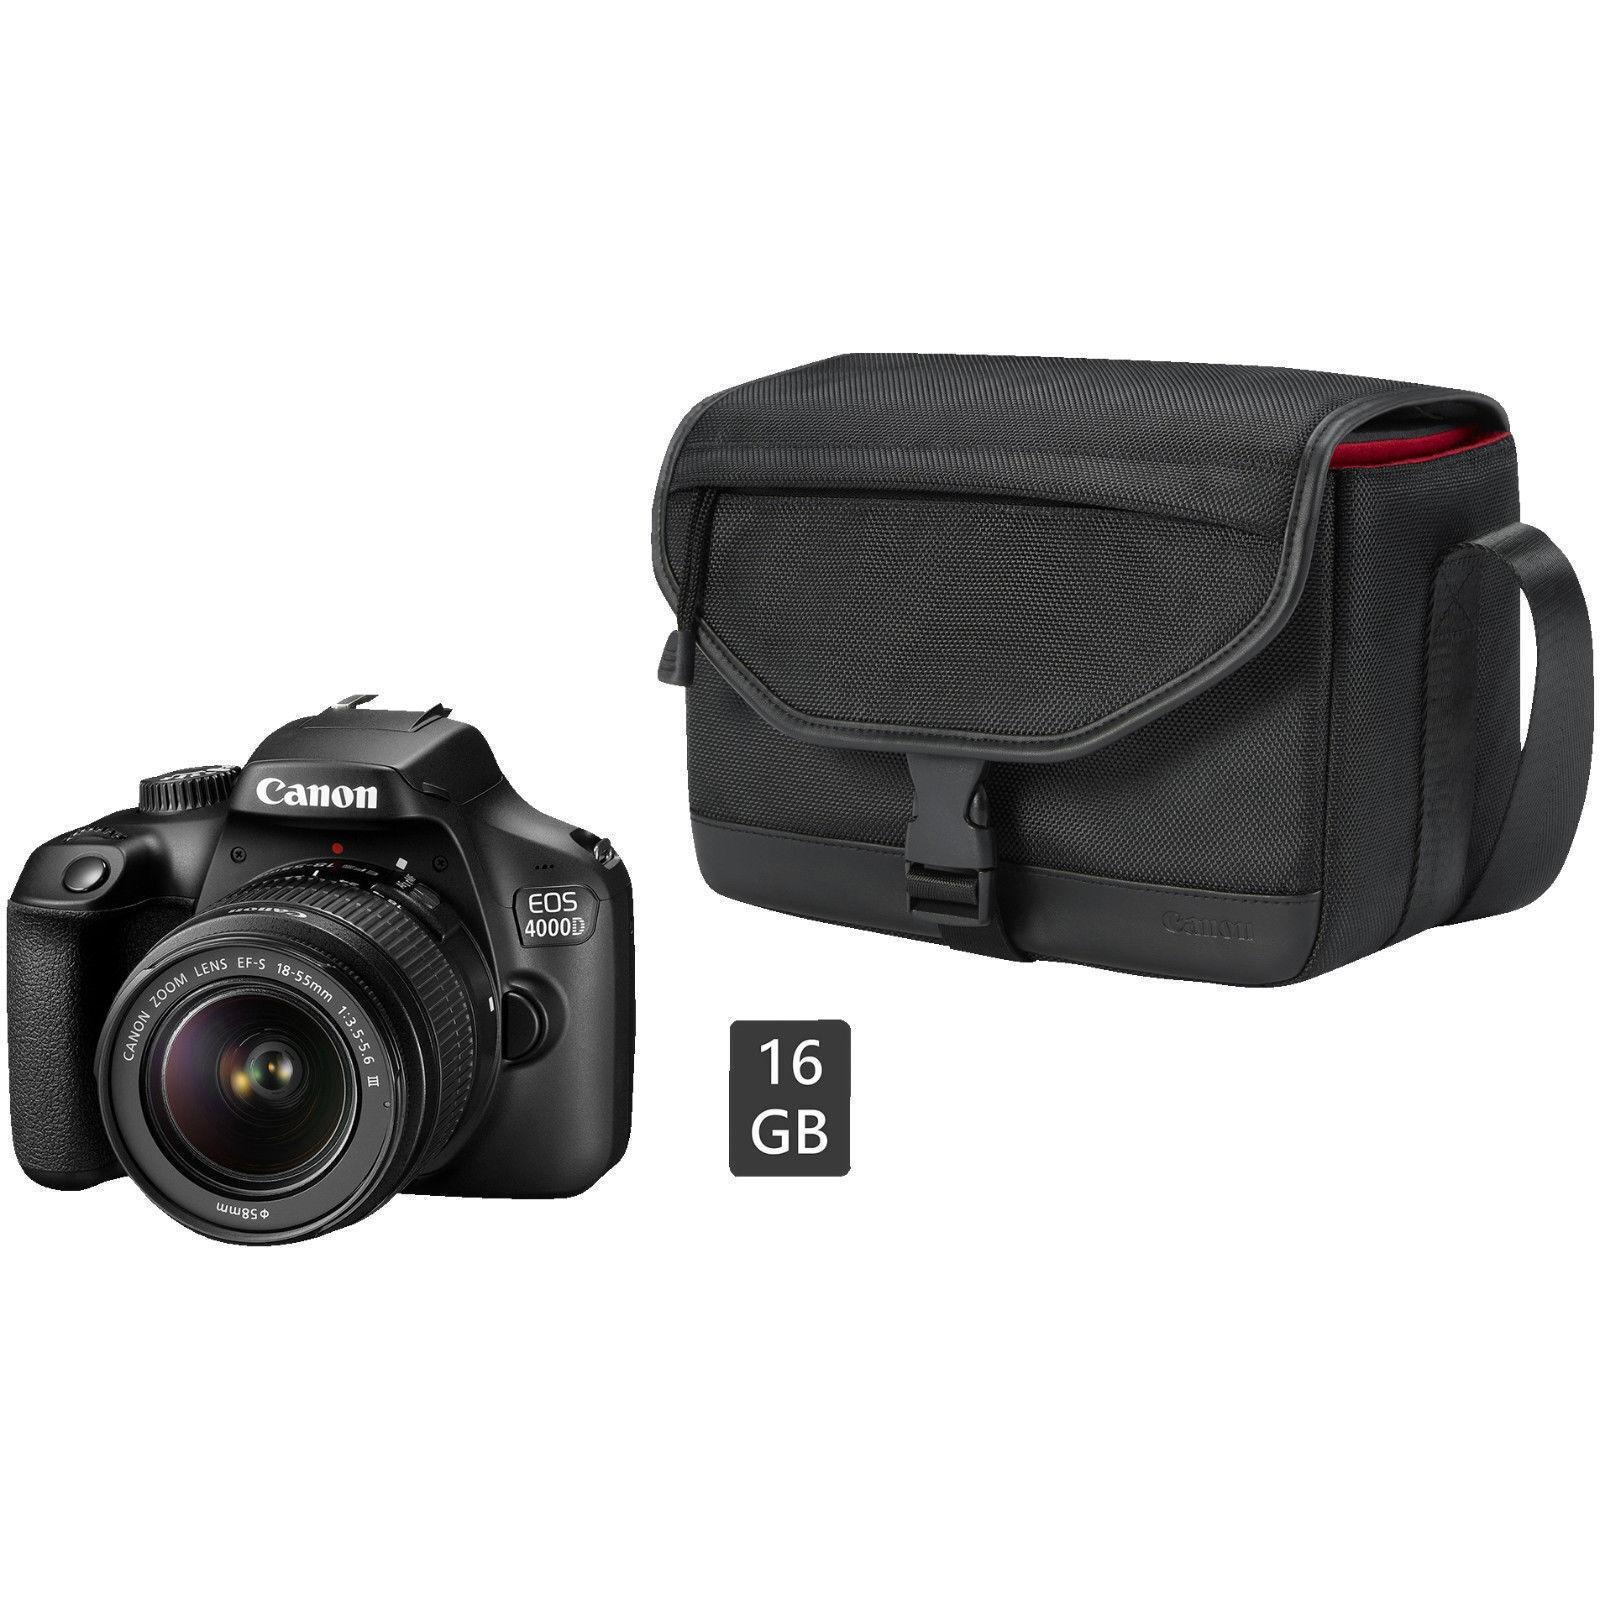 CANON EOS 4000D Kit Spiegelreflexkamera Objektiv 18-55 mm f/5.6 Zubehörpaket NEU